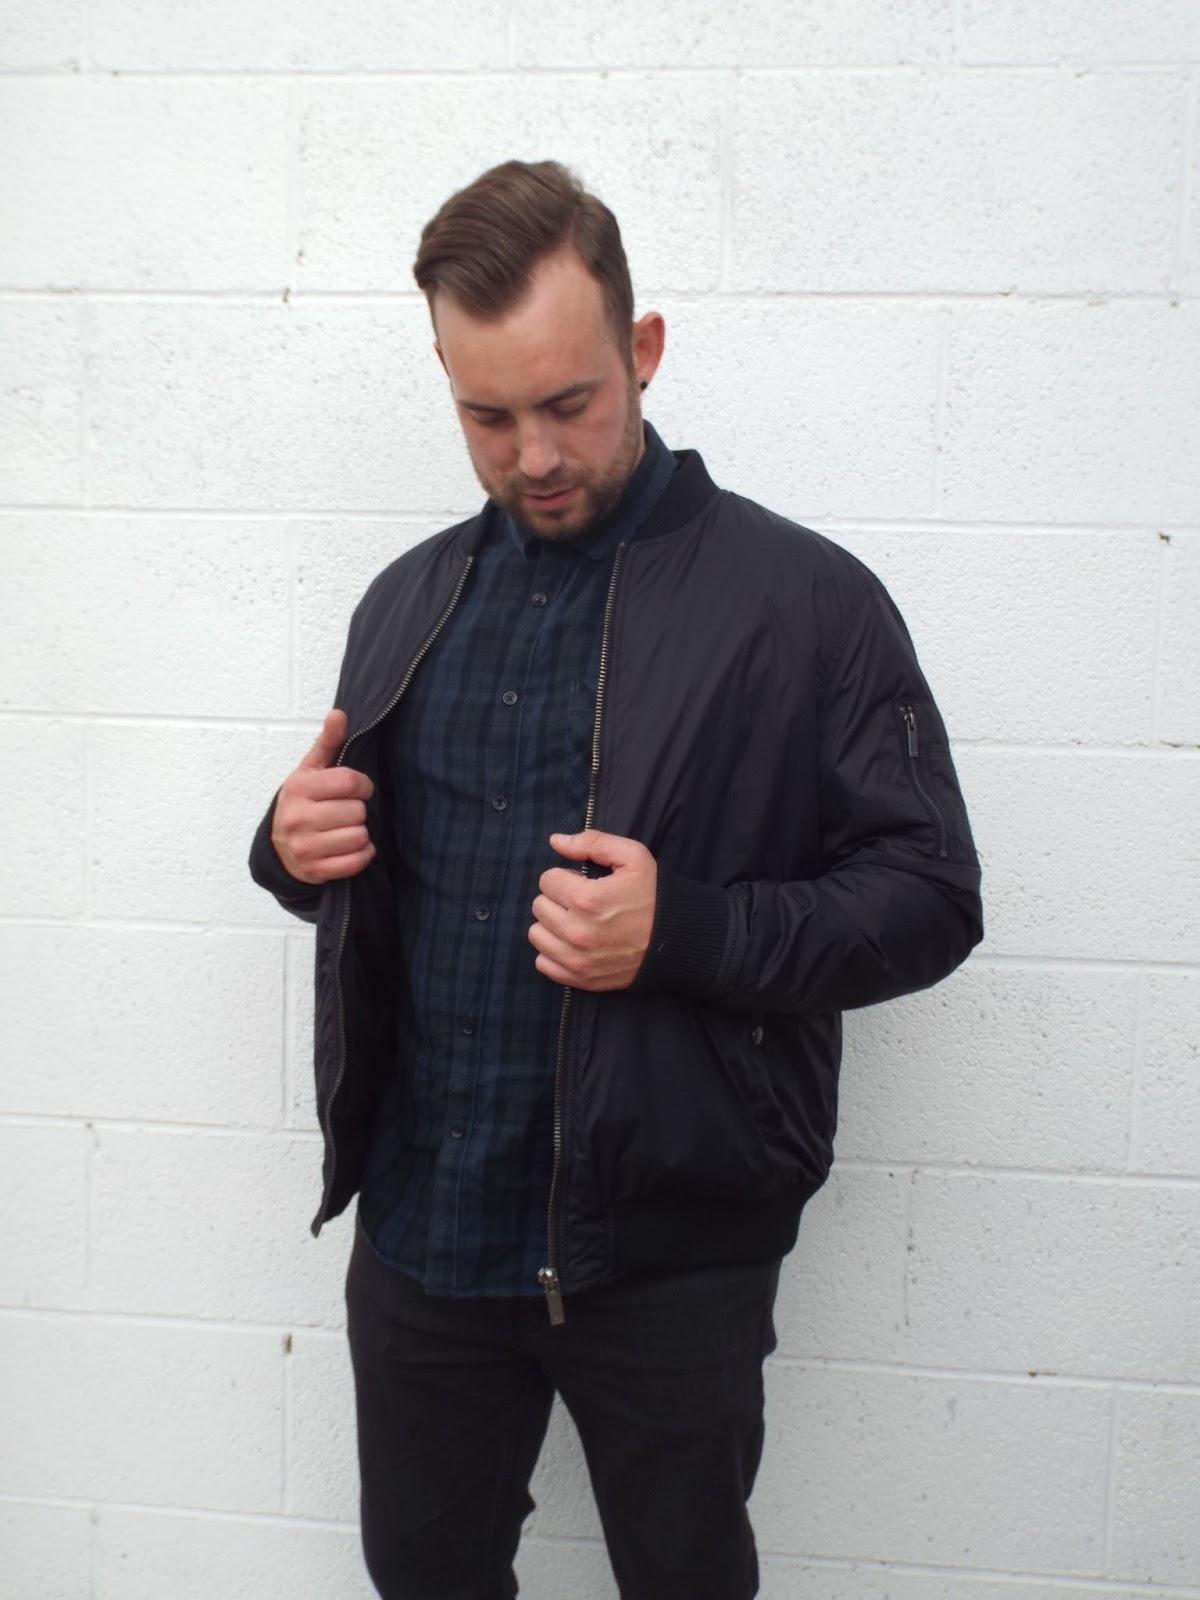 Burton menswear checked green and blue shirt